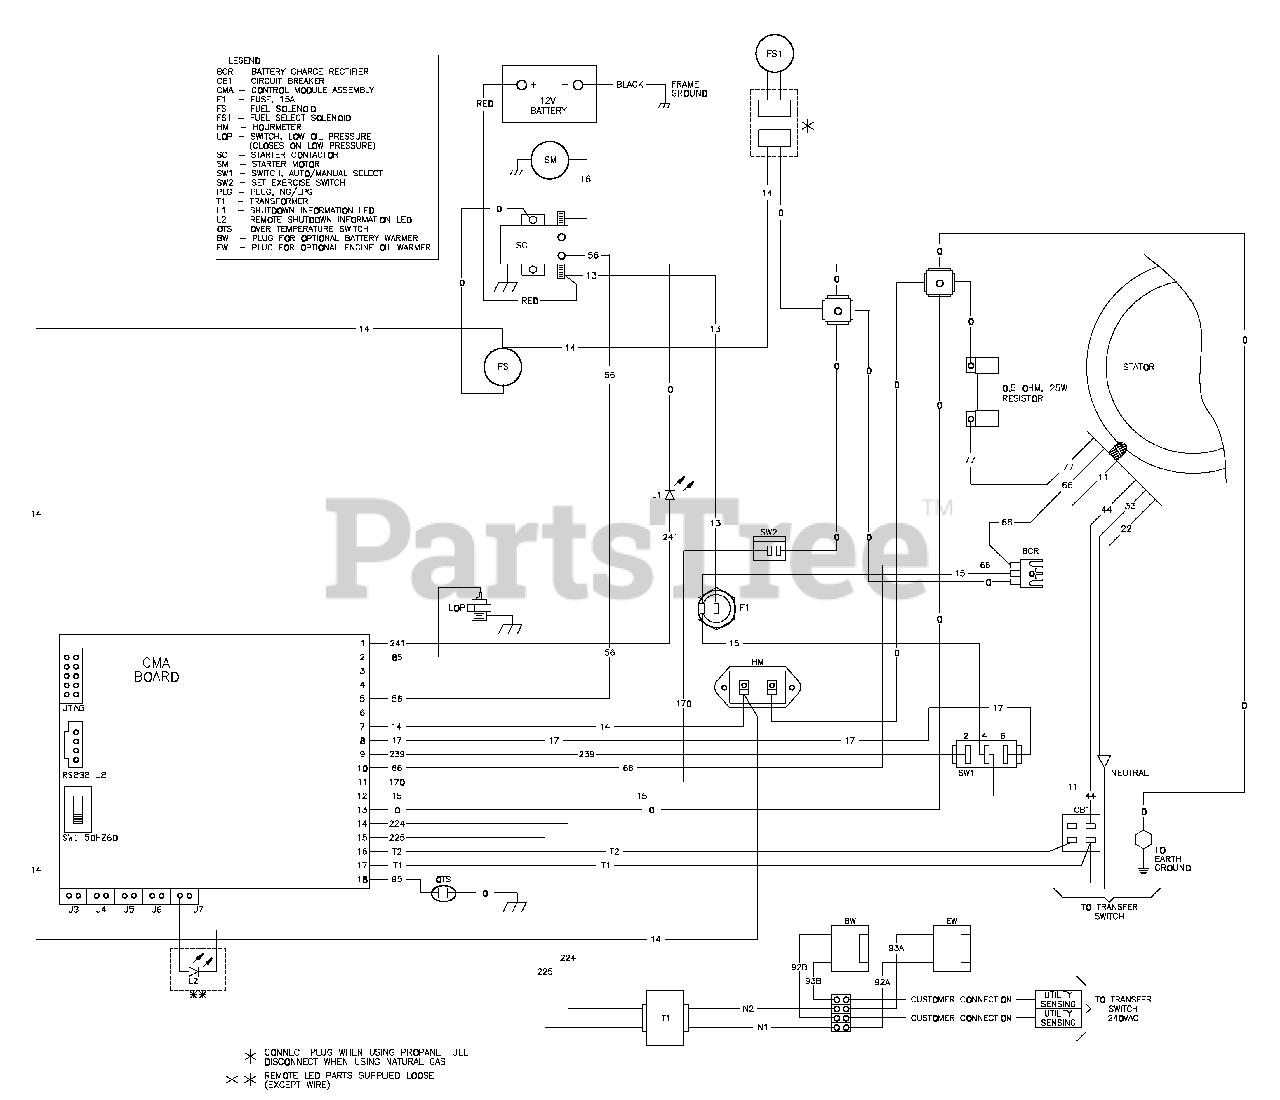 Briggs Stratton 01815 0 Briggs Stratton 12kw Home Standby Generator Wiring Diagram Standby Generator 192391wd Parts Lookup With Diagrams Partstree